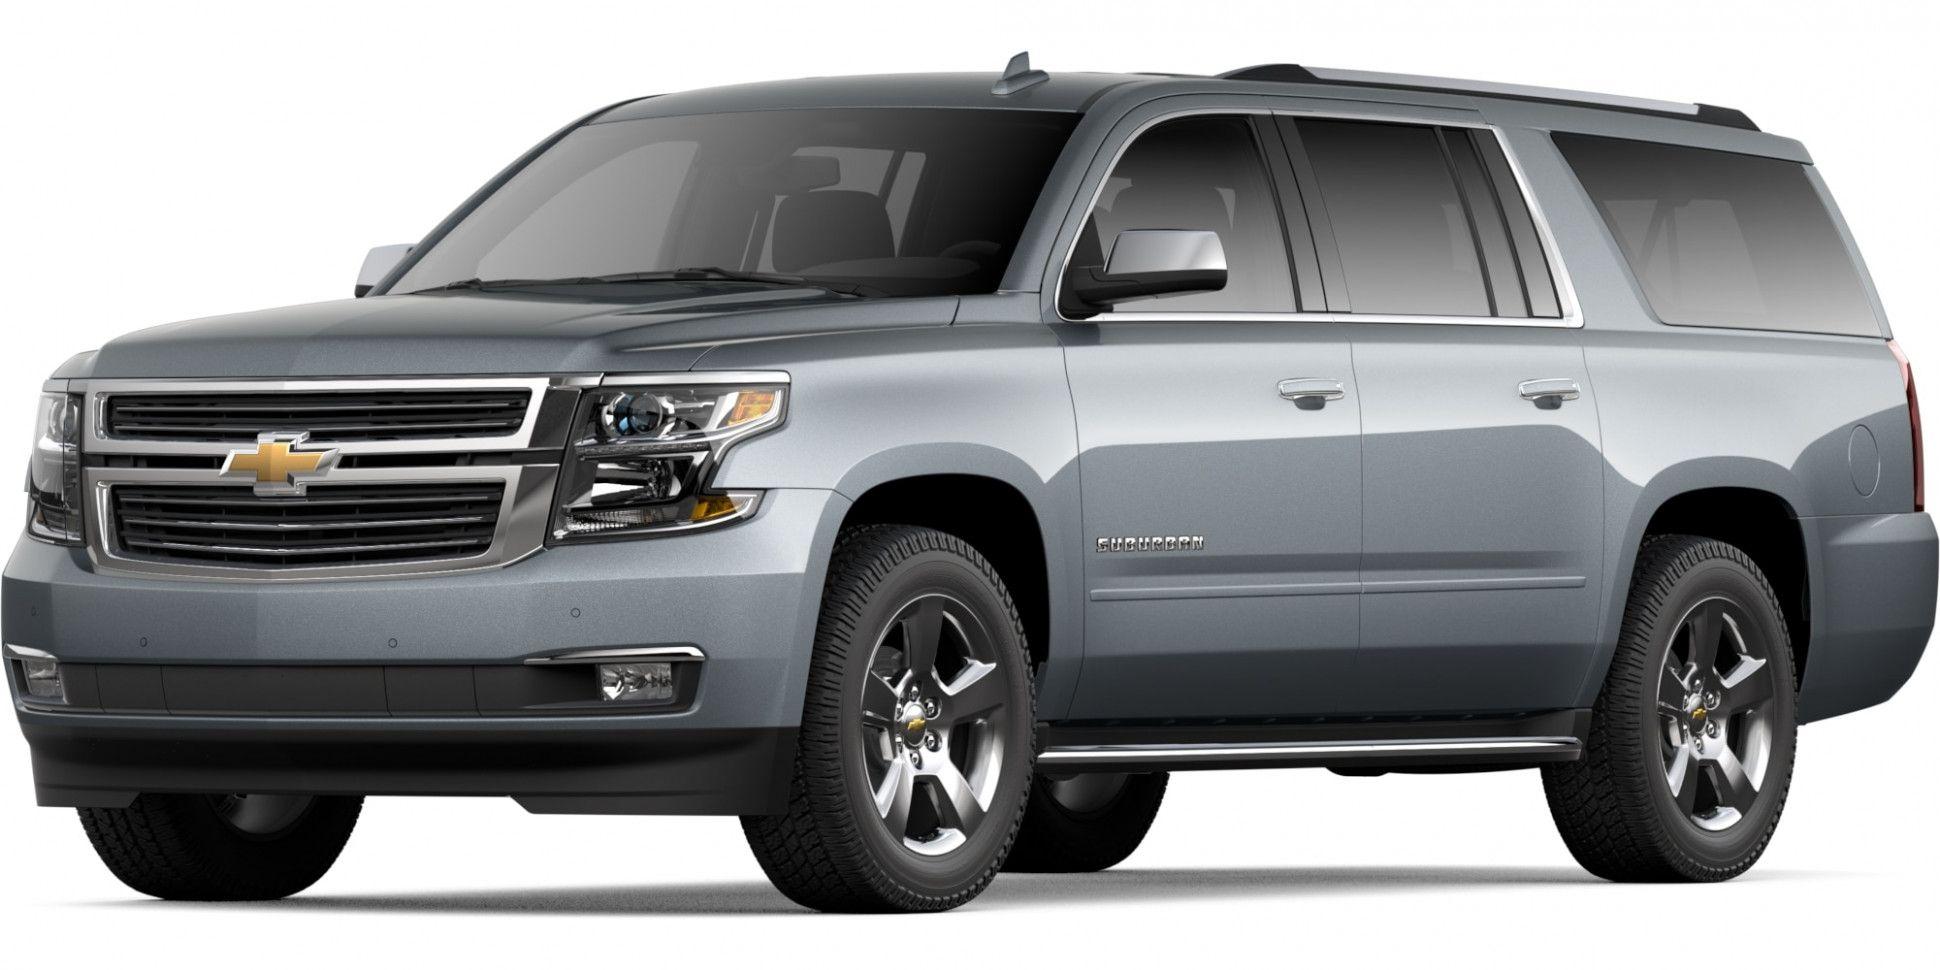 2020 Chevrolet Suburban Xlt Price Chevrolet Suburban Large Suv